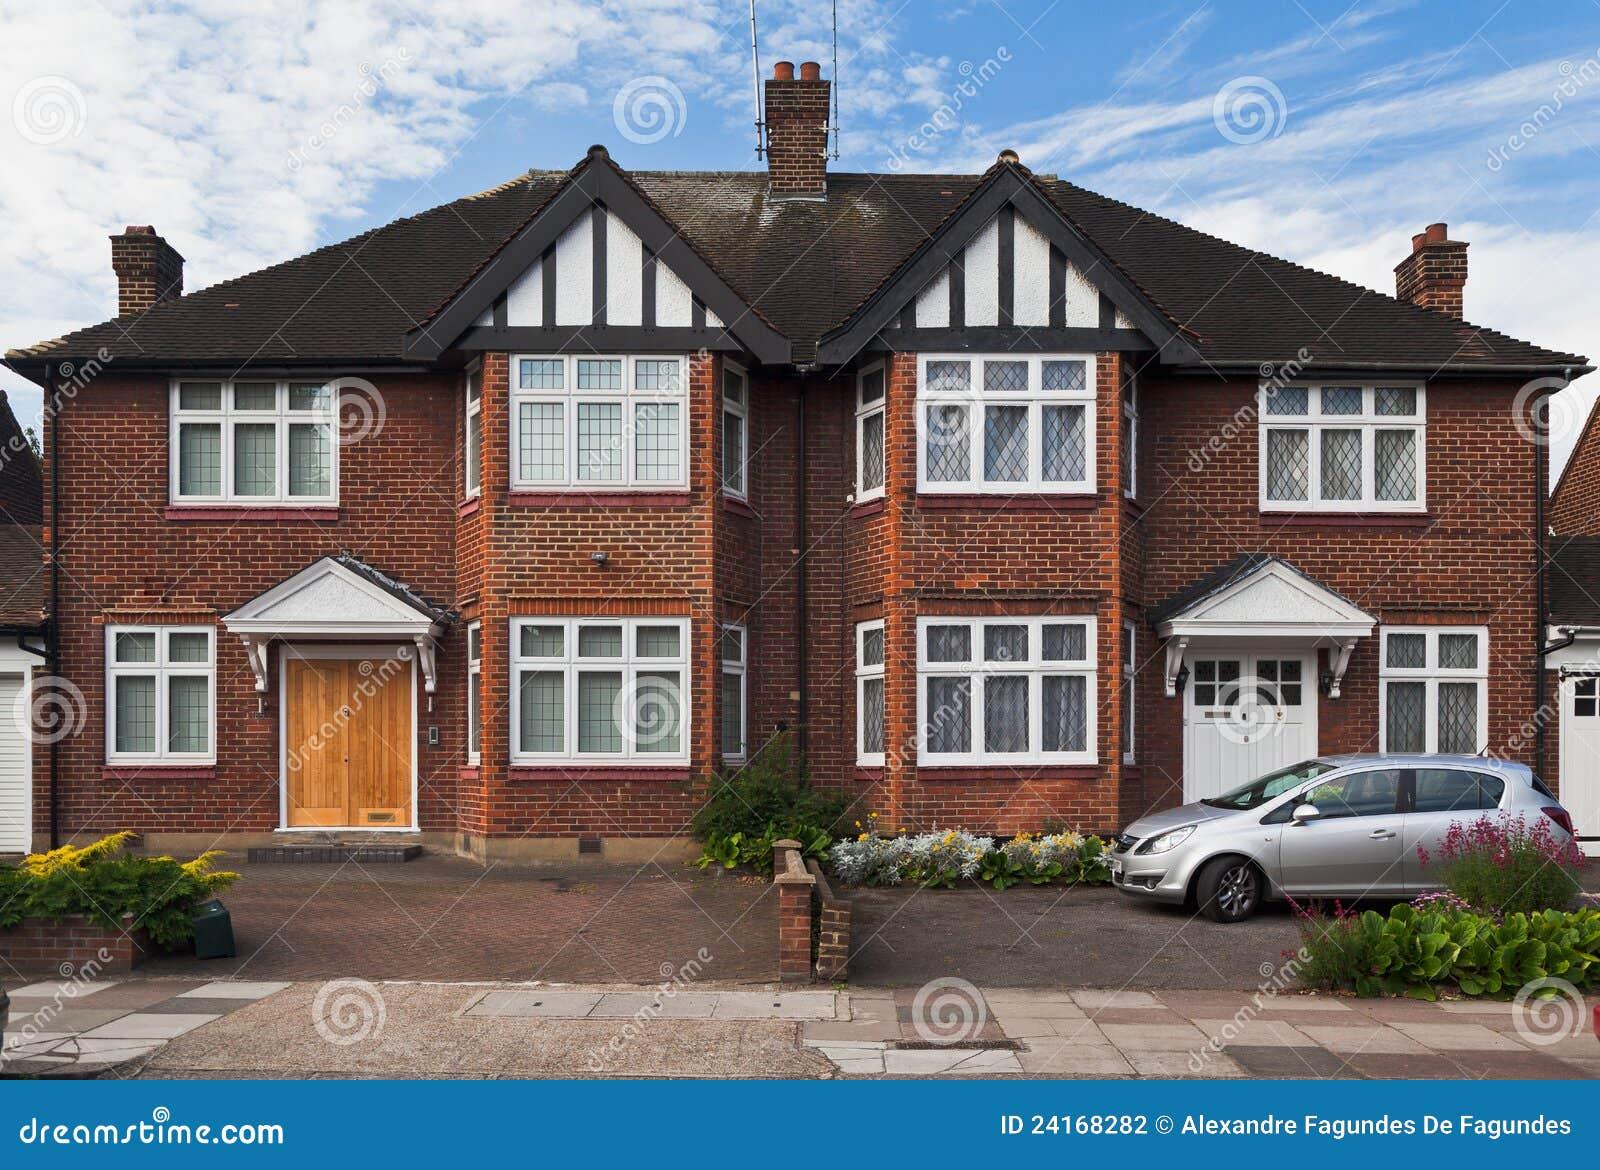 Typical British Brick House London England Stock